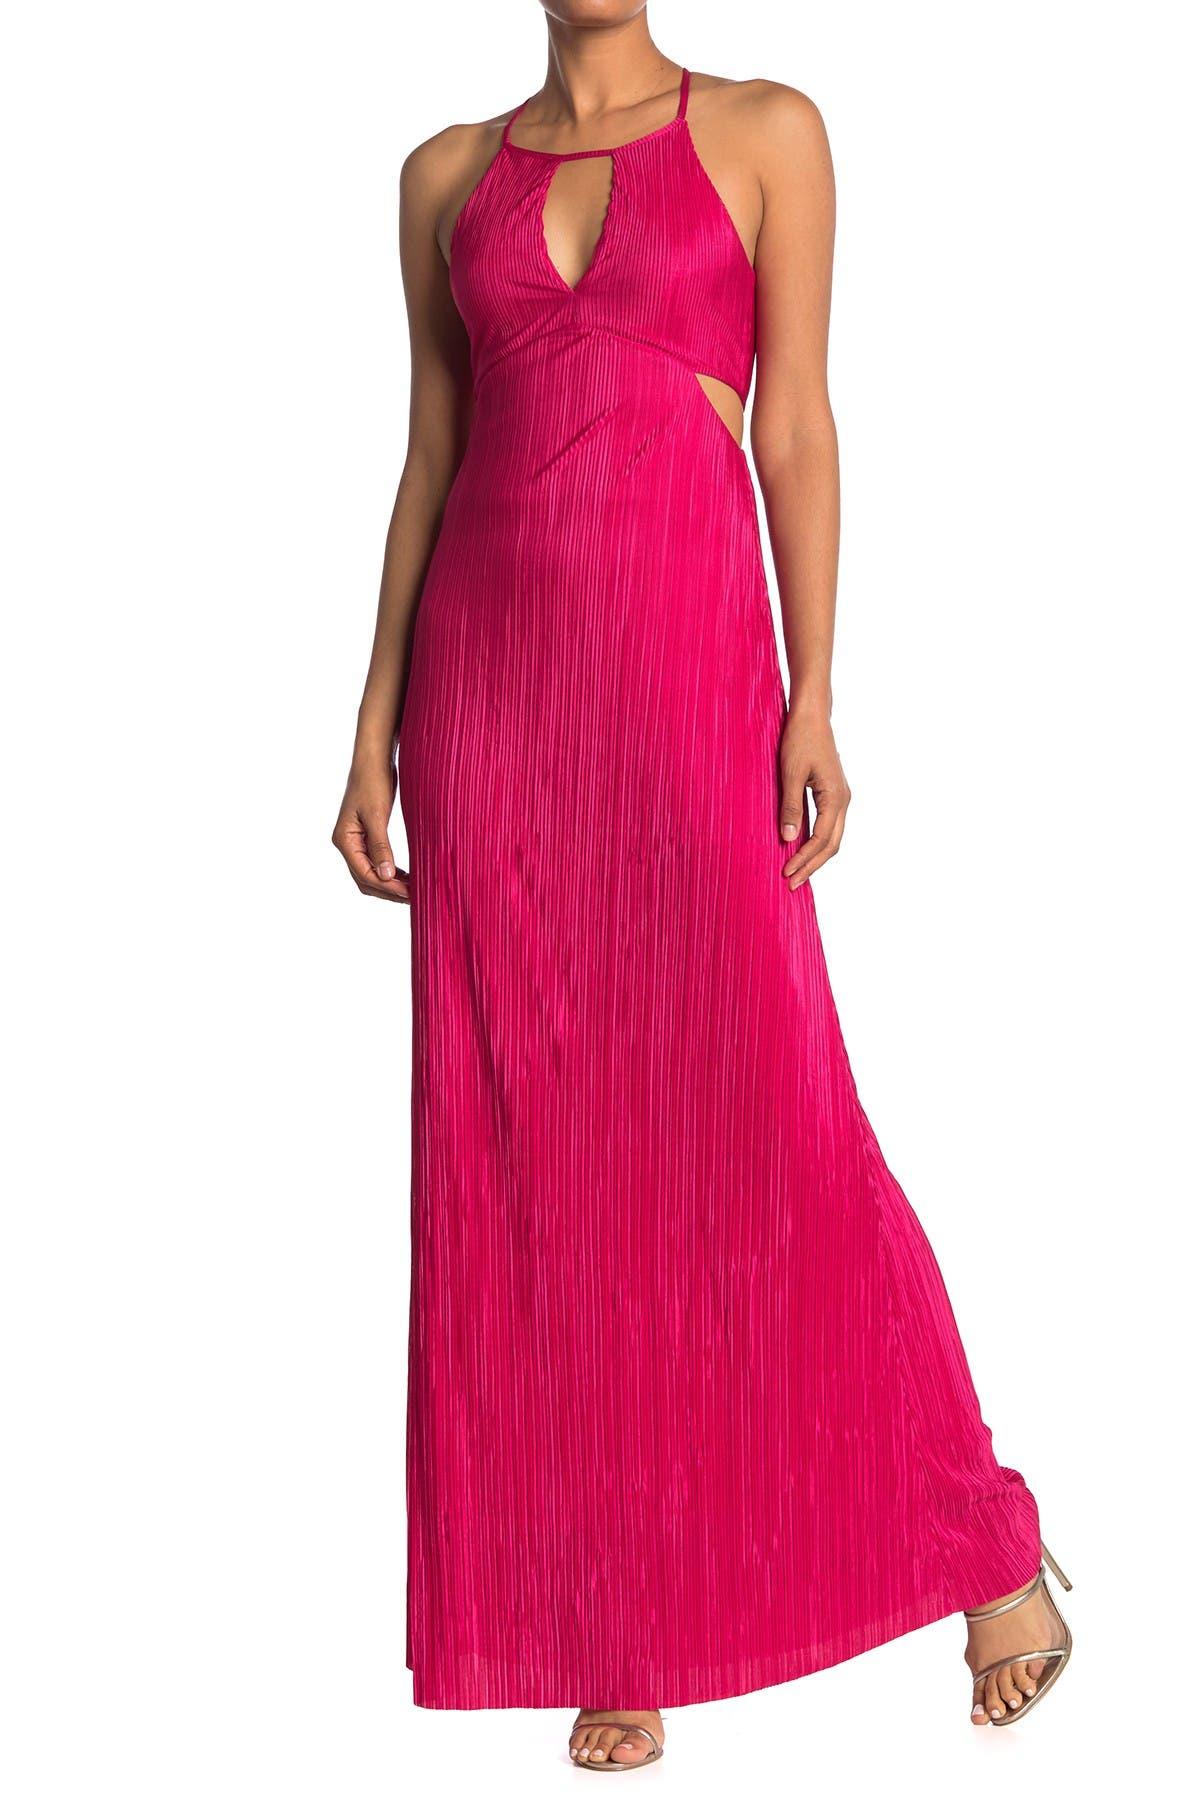 Image of BCBGeneration Sleeveless Cutout Maxi Dress